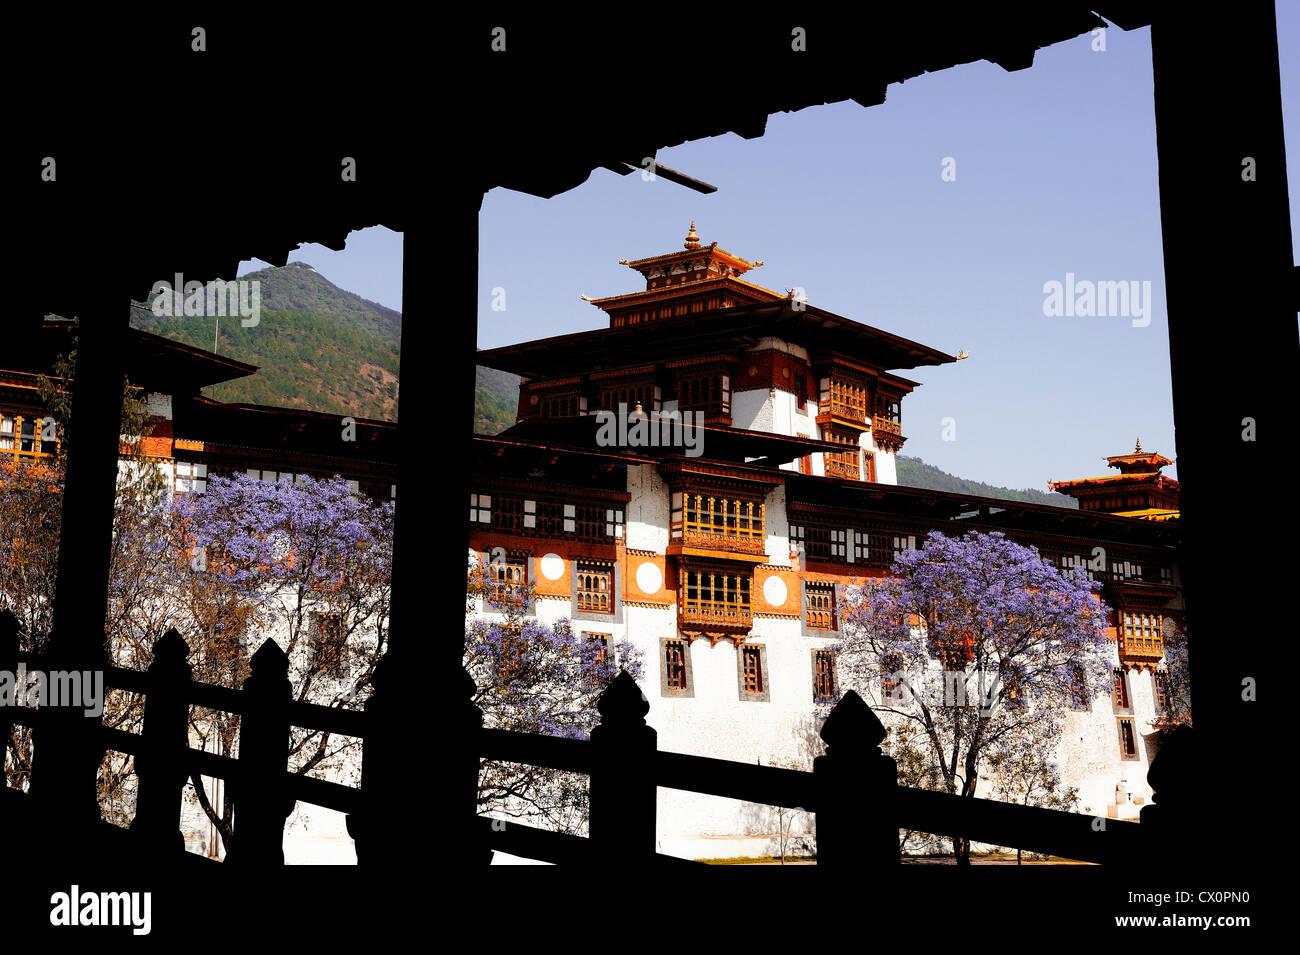 The Punakha Dzong, is the administrative centre of Punakha dzongkhag in Punakha, Bhutan - Stock Image